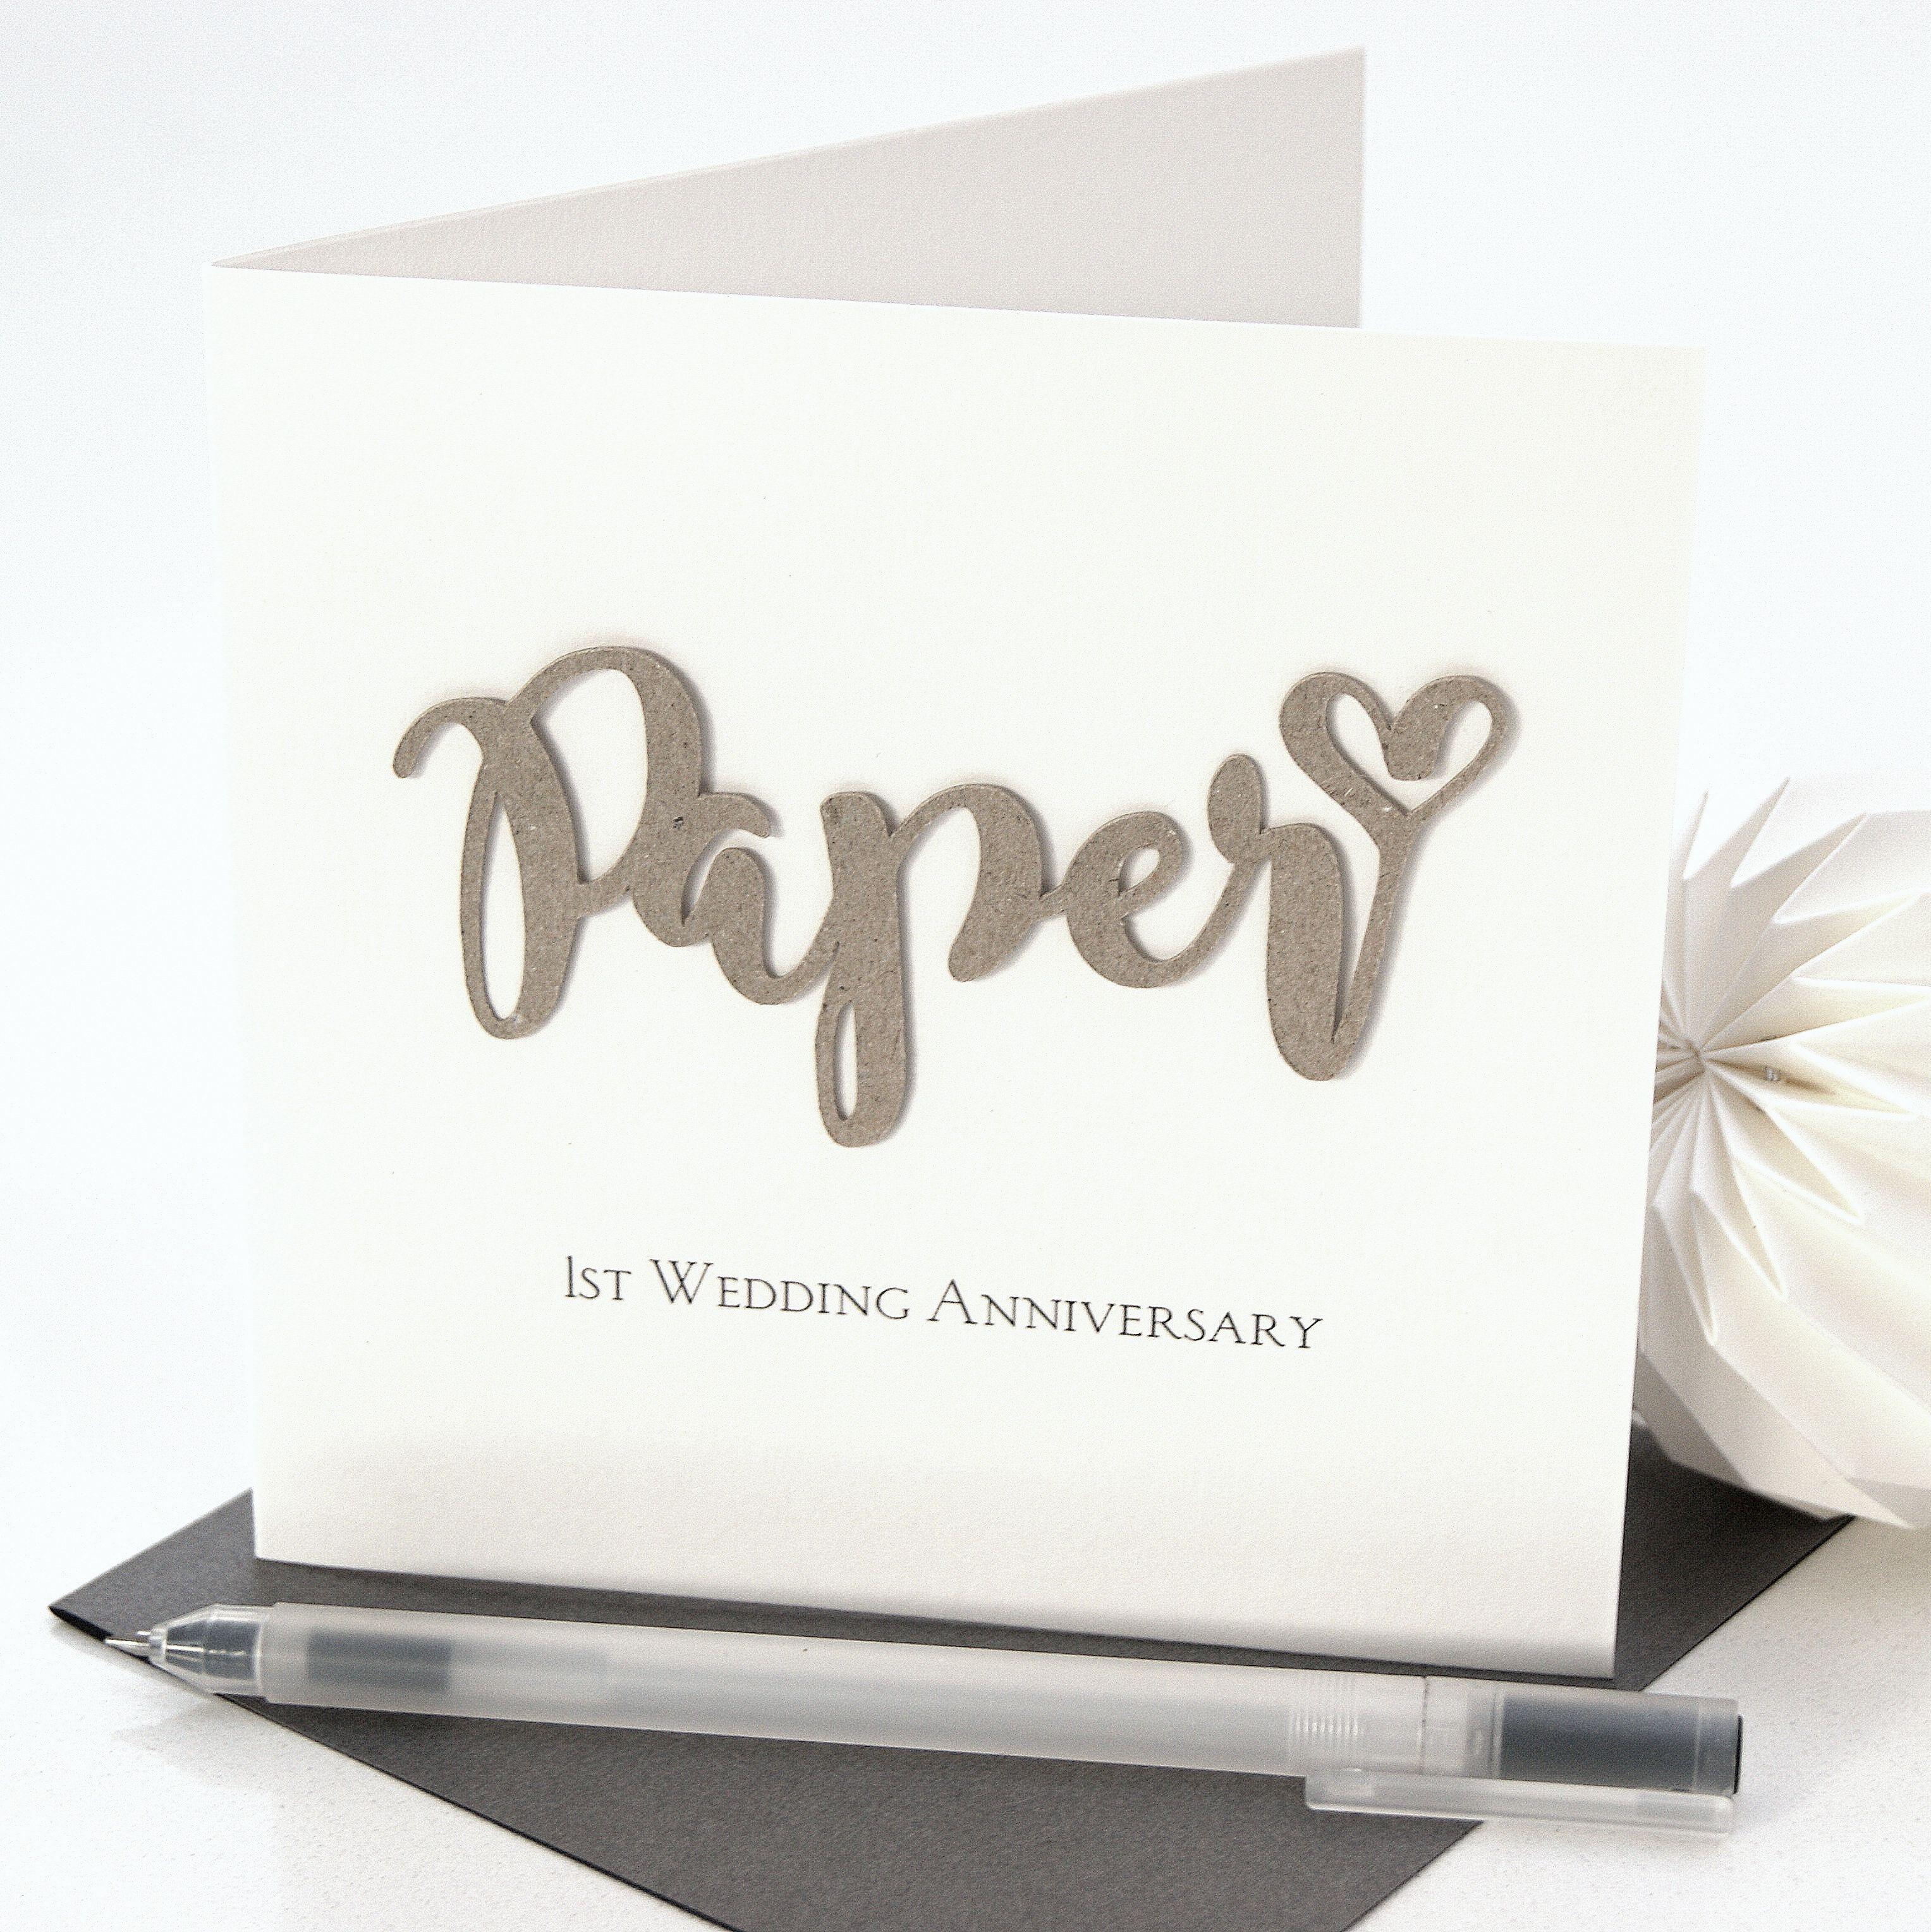 paper 1st wedding anniversary card invitations4weddings